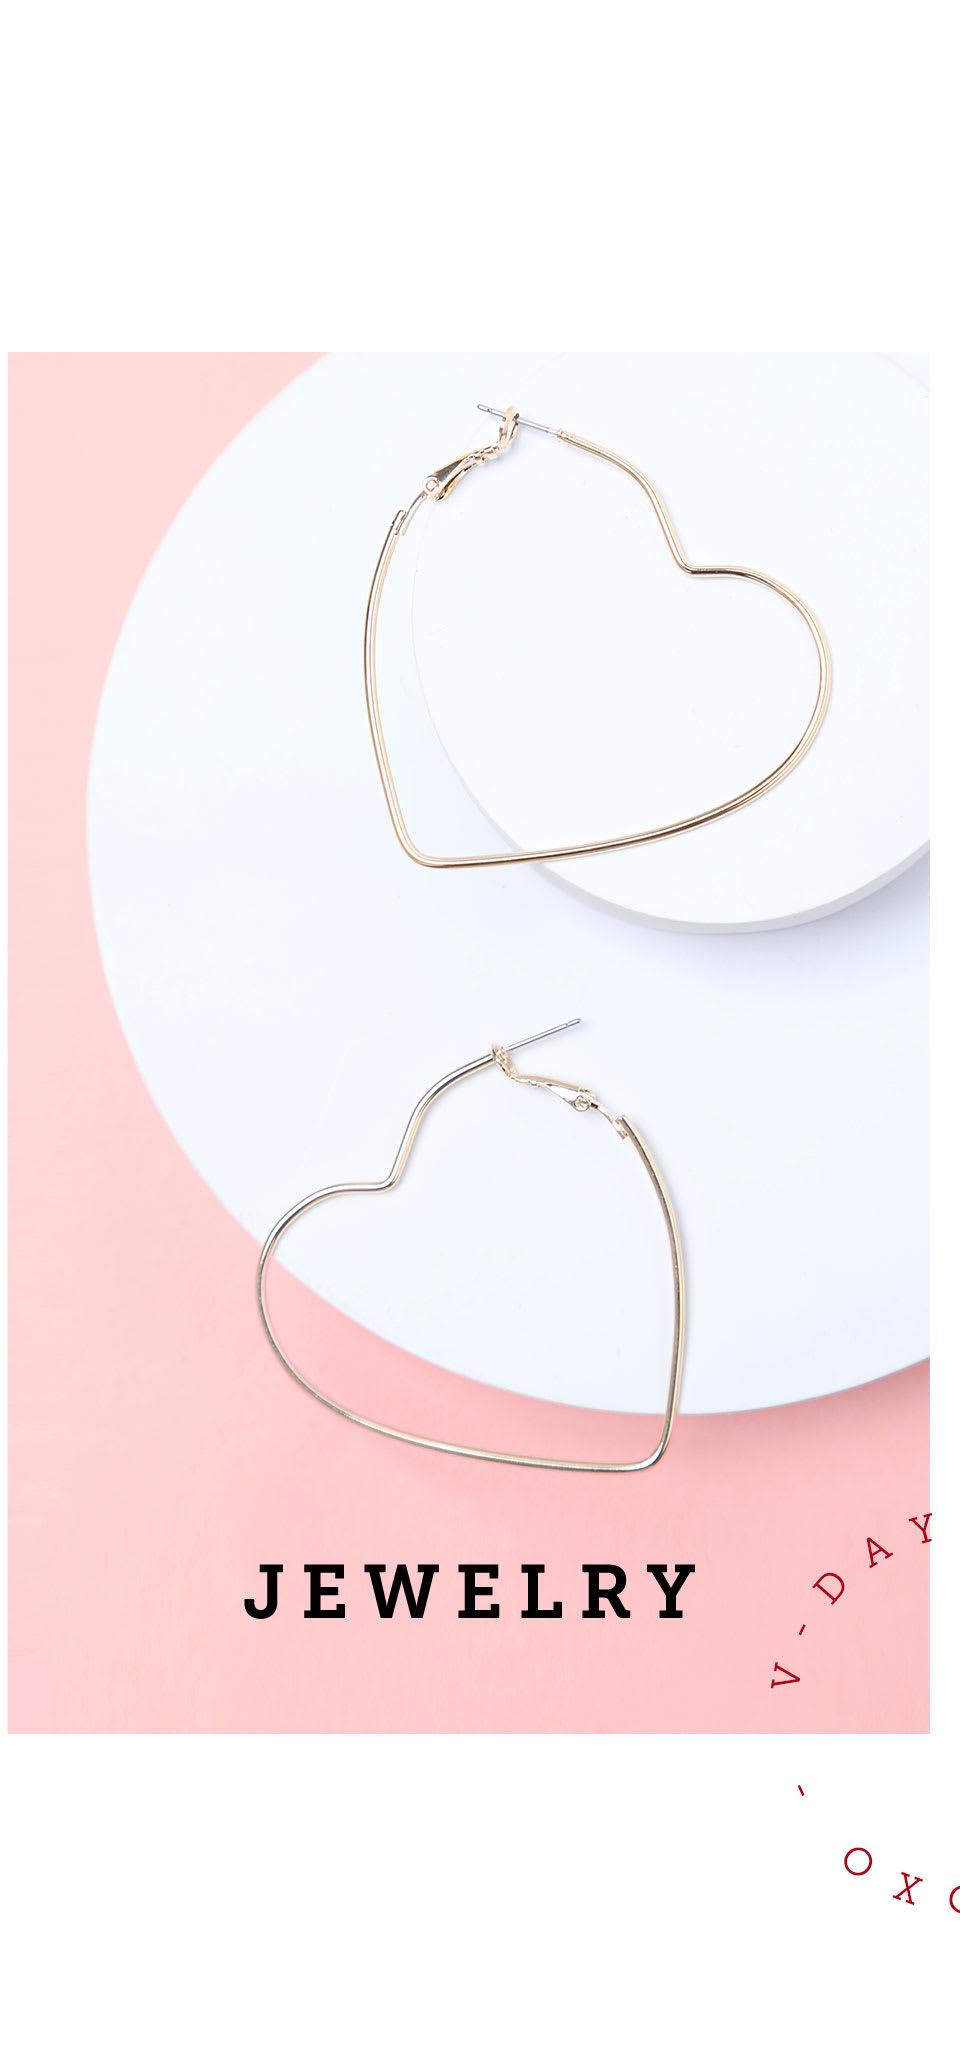 Shop Jewelry for Women.